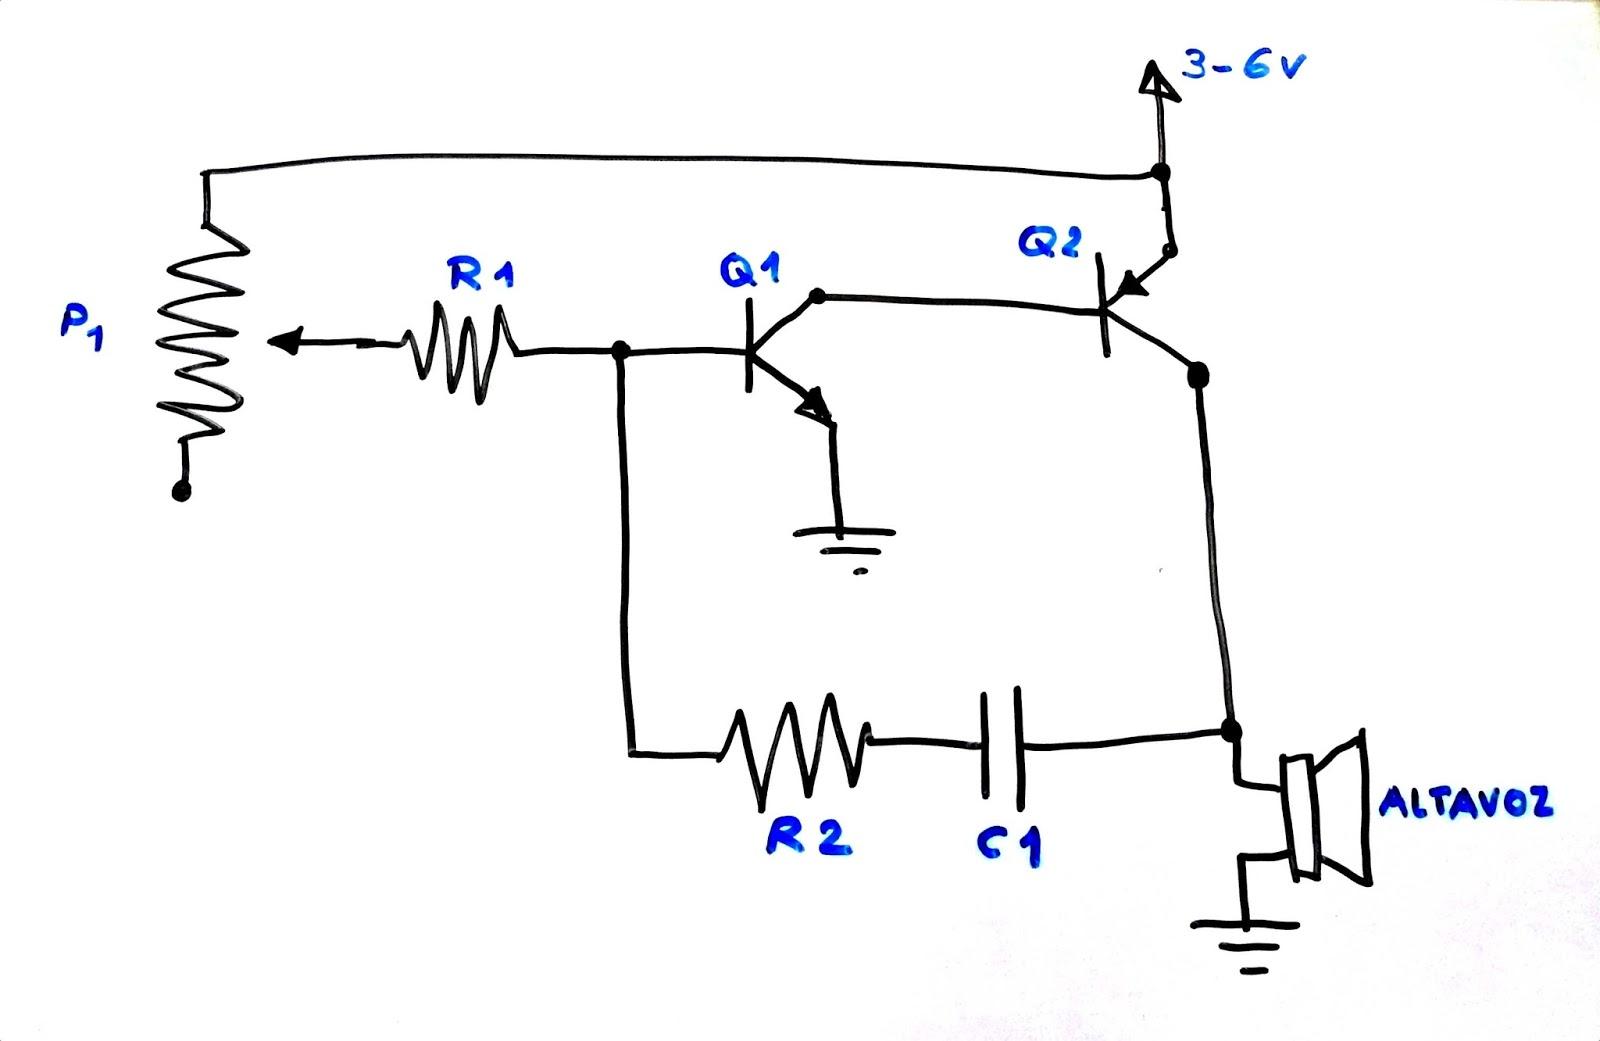 Corriente Aerea Pequeno Circuito Para Generar Un Tono Audible